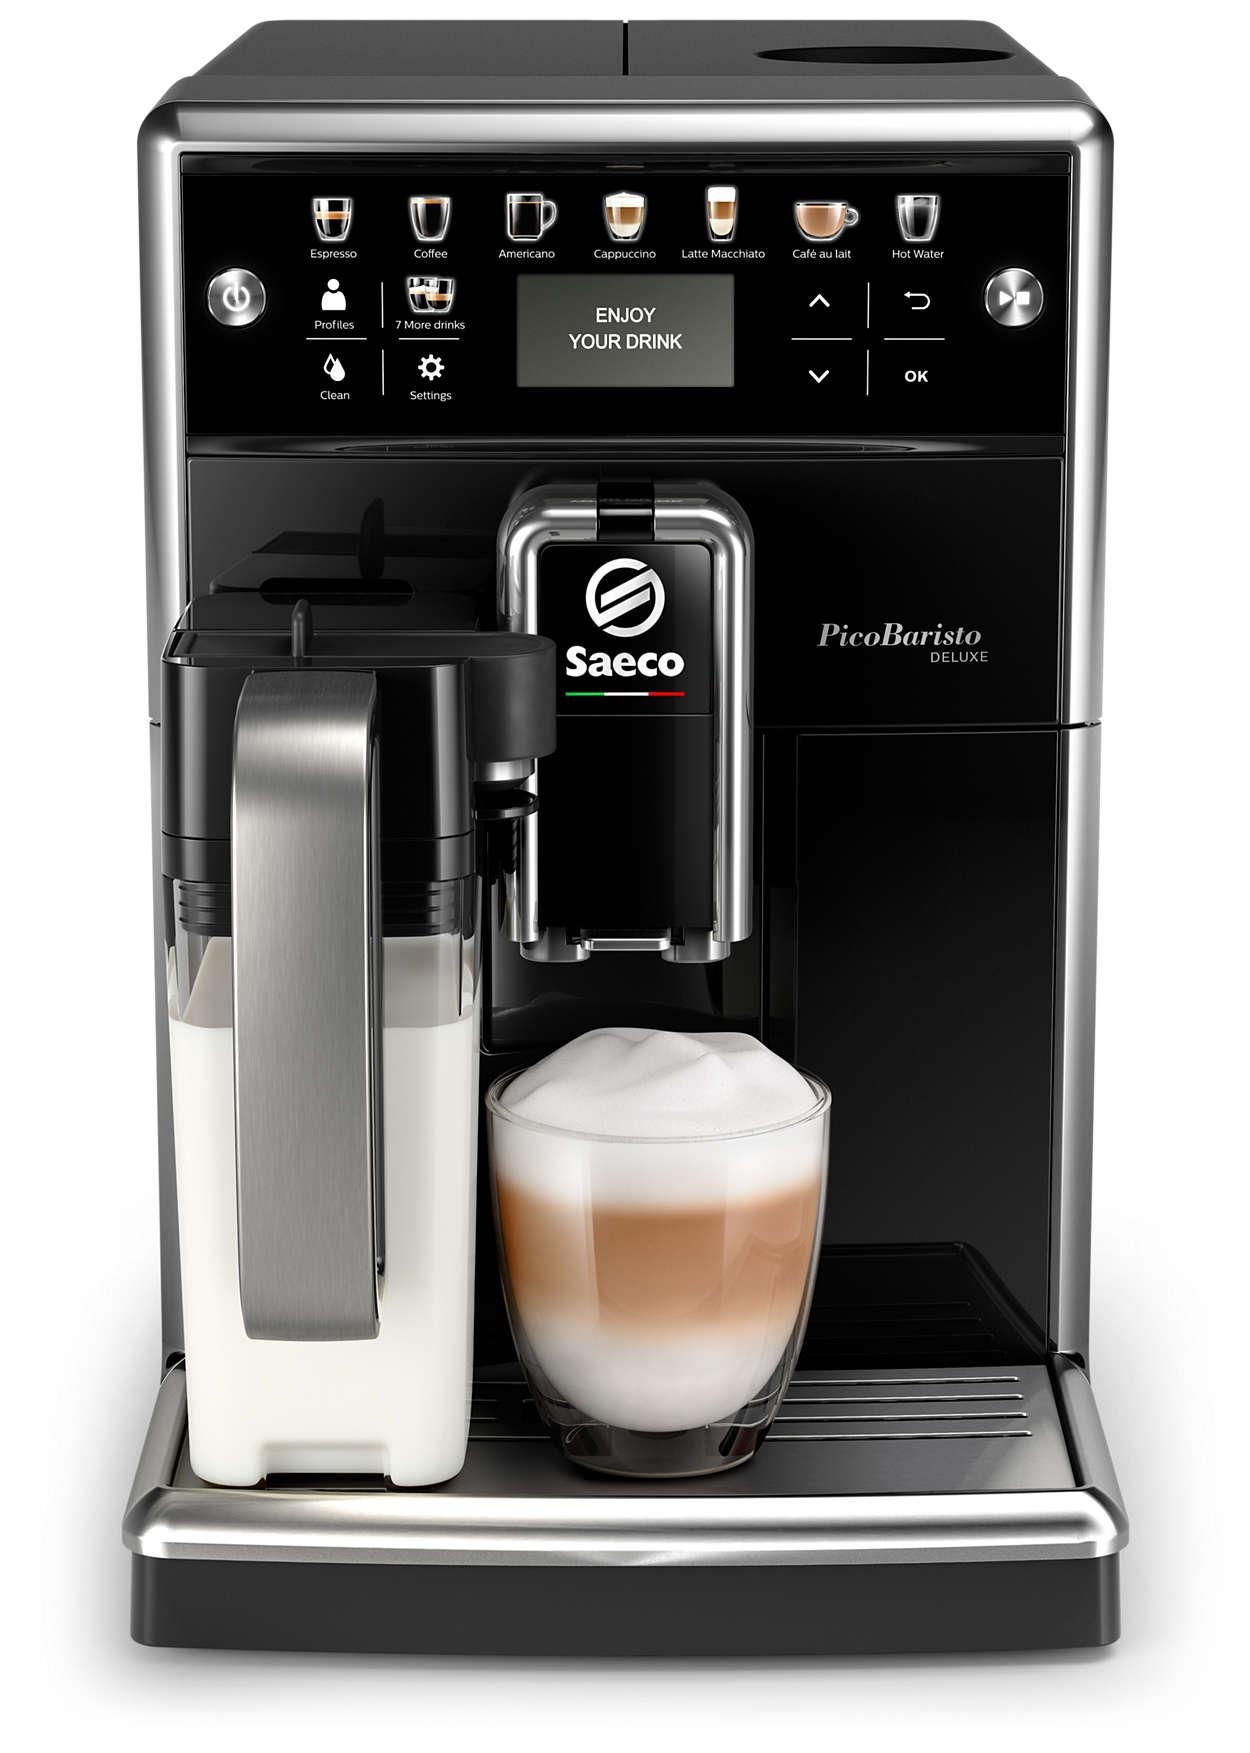 7b9fdb1ce81 PicoBaristo Deluxe Täisautomaatne espressomasin SM5570/10   Saeco